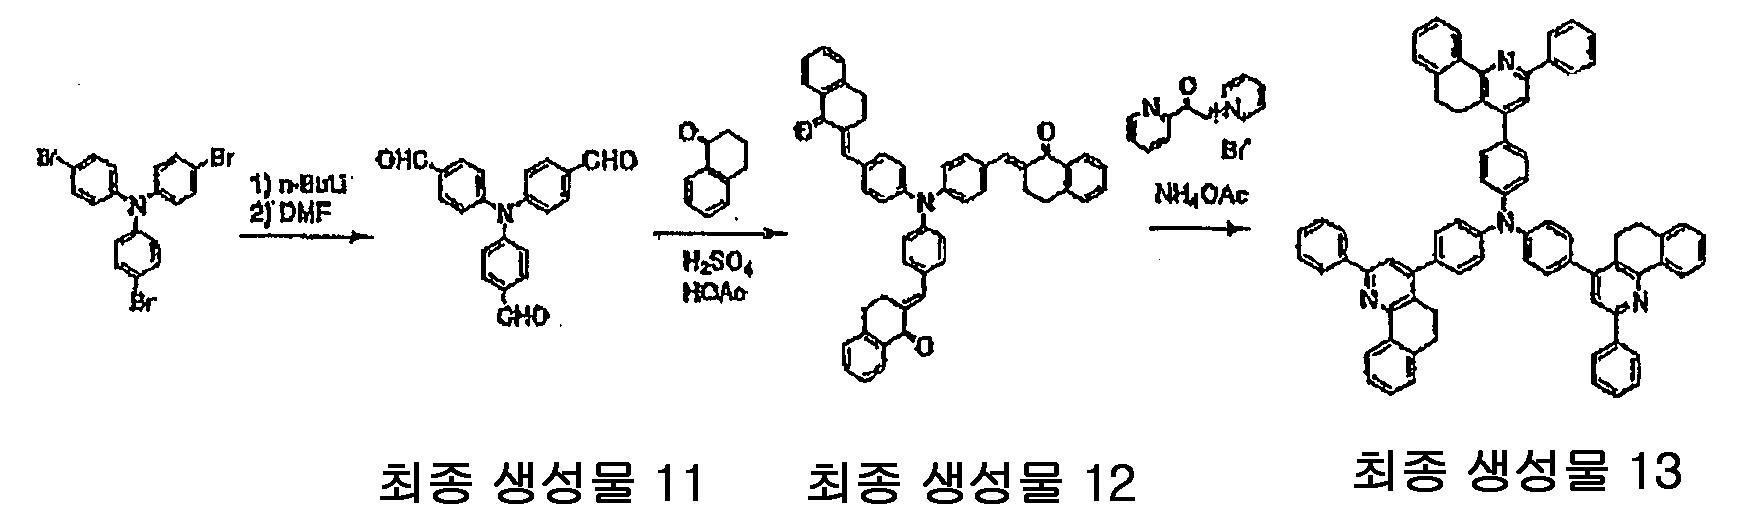 Figure 112010002231902-pat00107